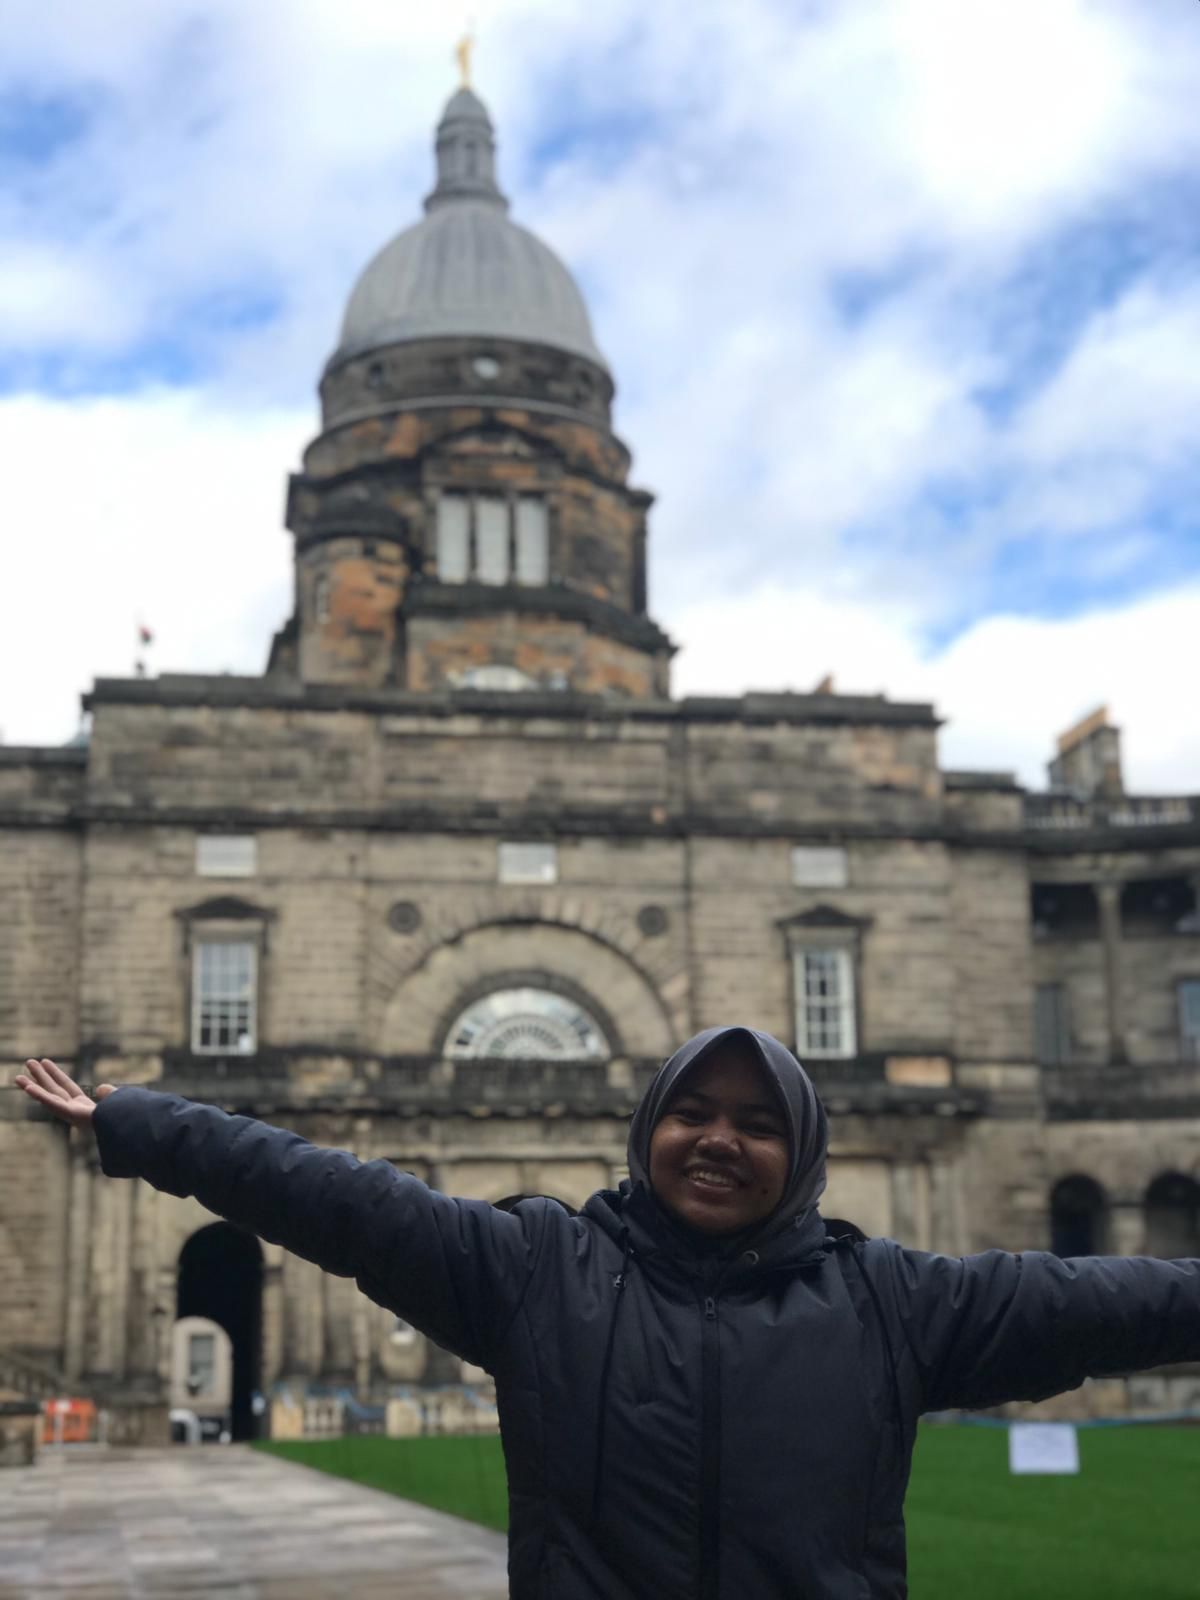 Anis Sofia Harjanti mahasiswa prodi Kedokteran  telah berada di University of Edinburgh, UK